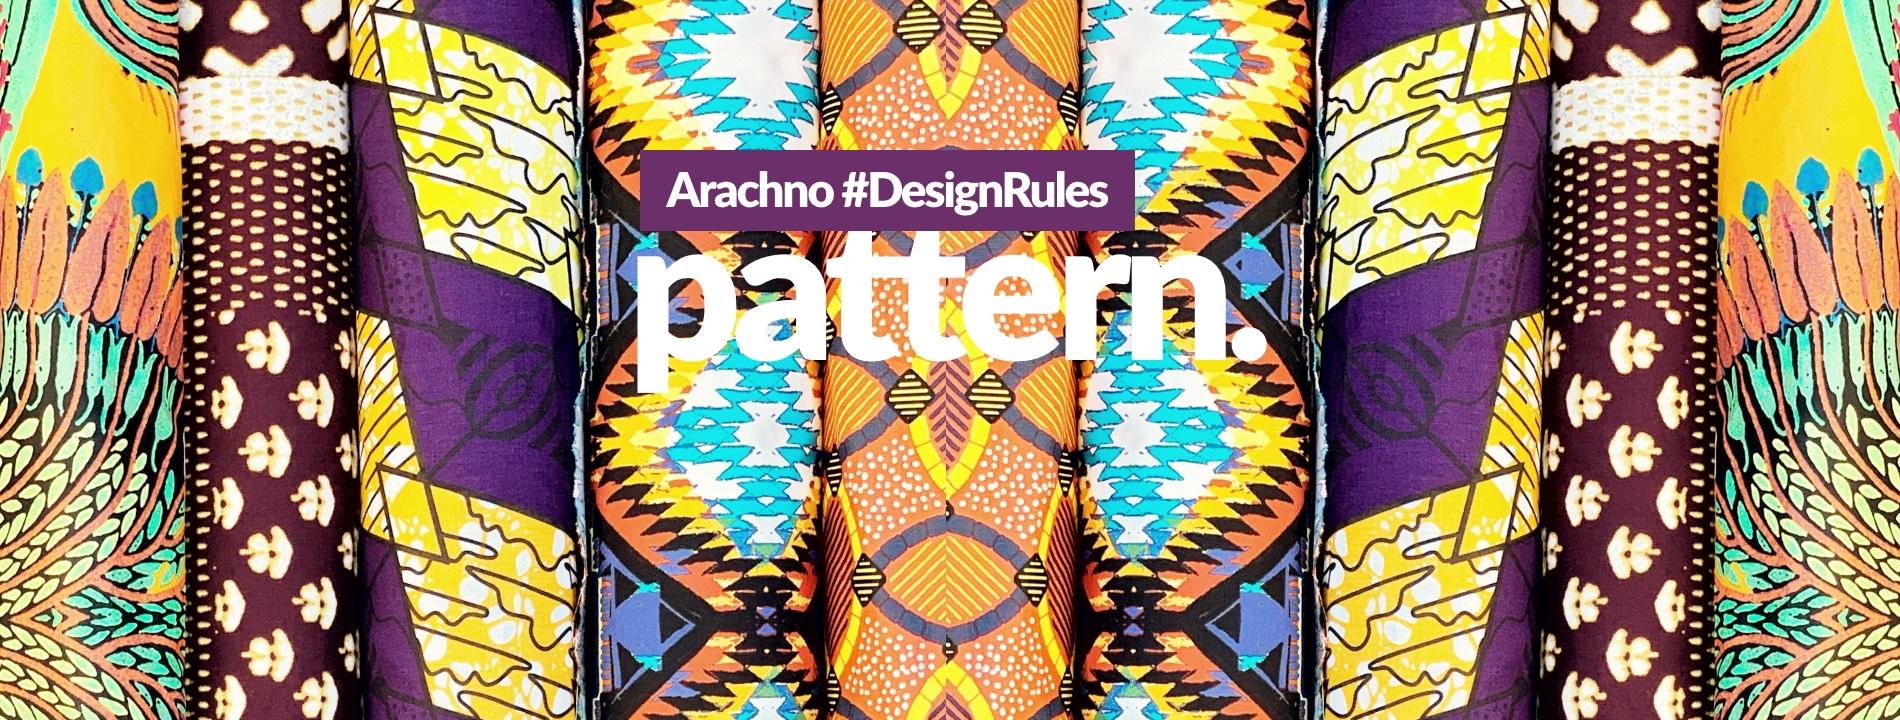 Arachno #DesignRules - pattern